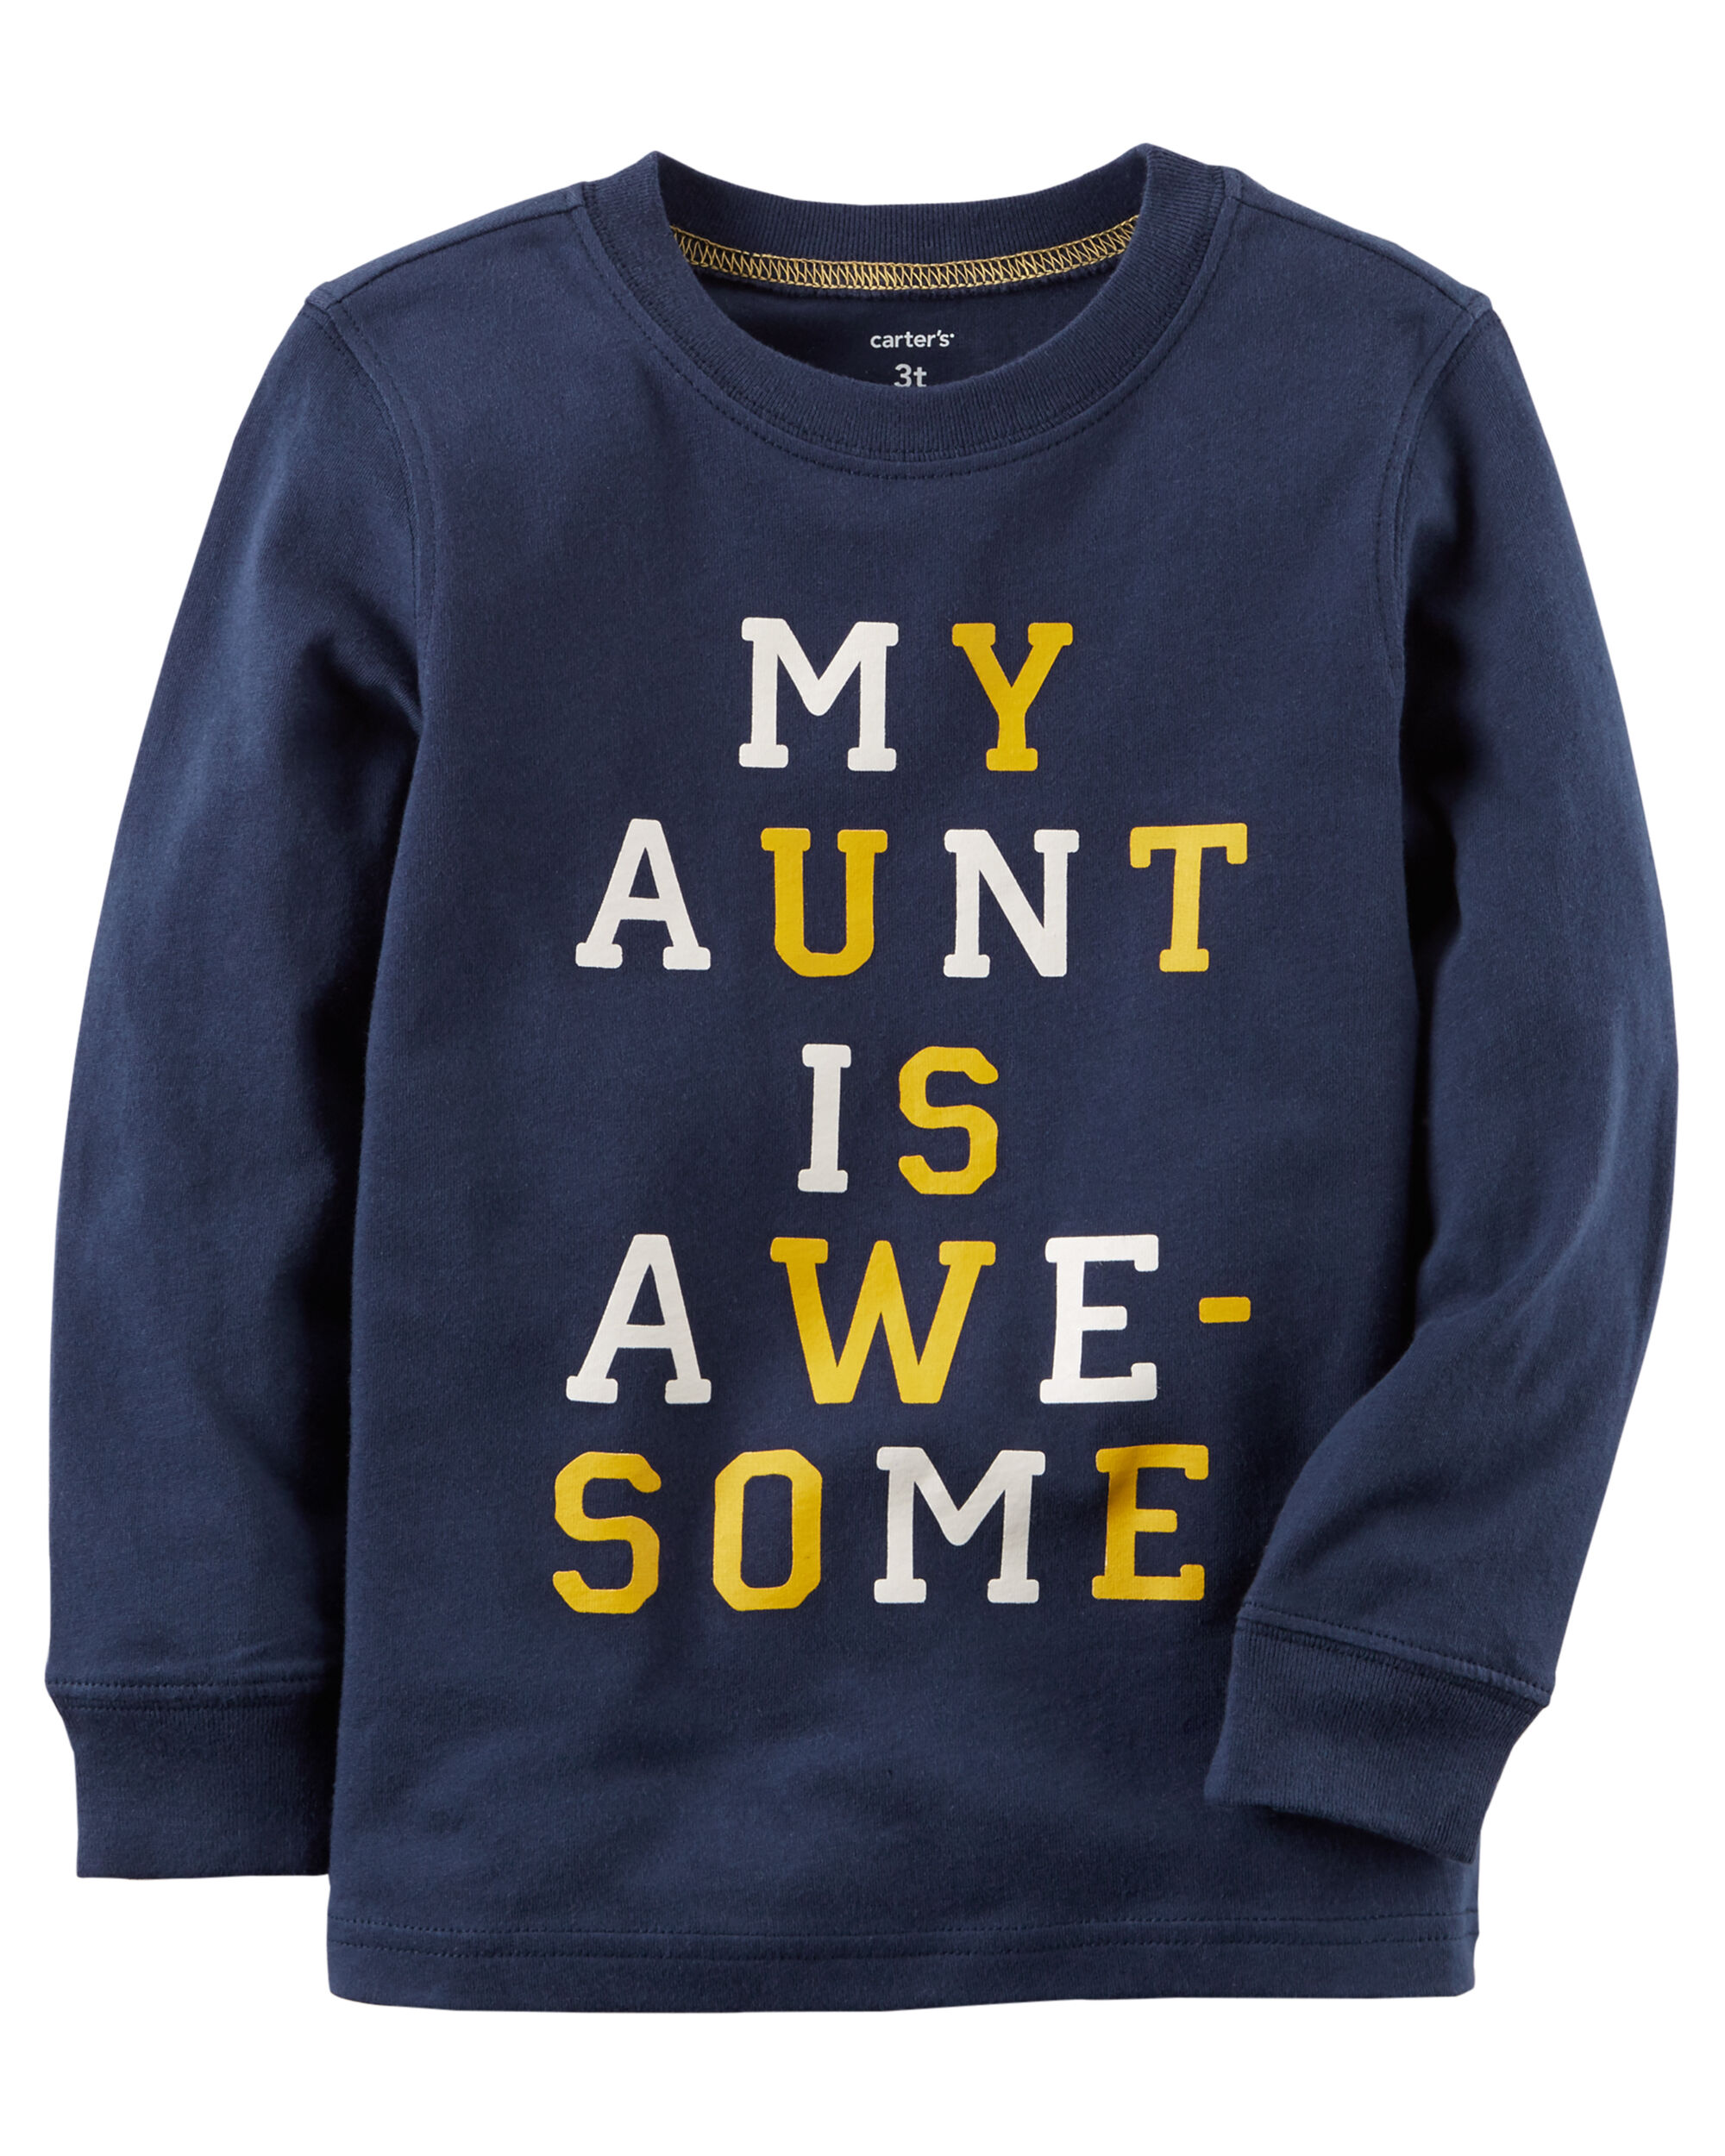 7e1e1aea0 Everyday Essentials Awesome Aunt Tee. Loading zoom